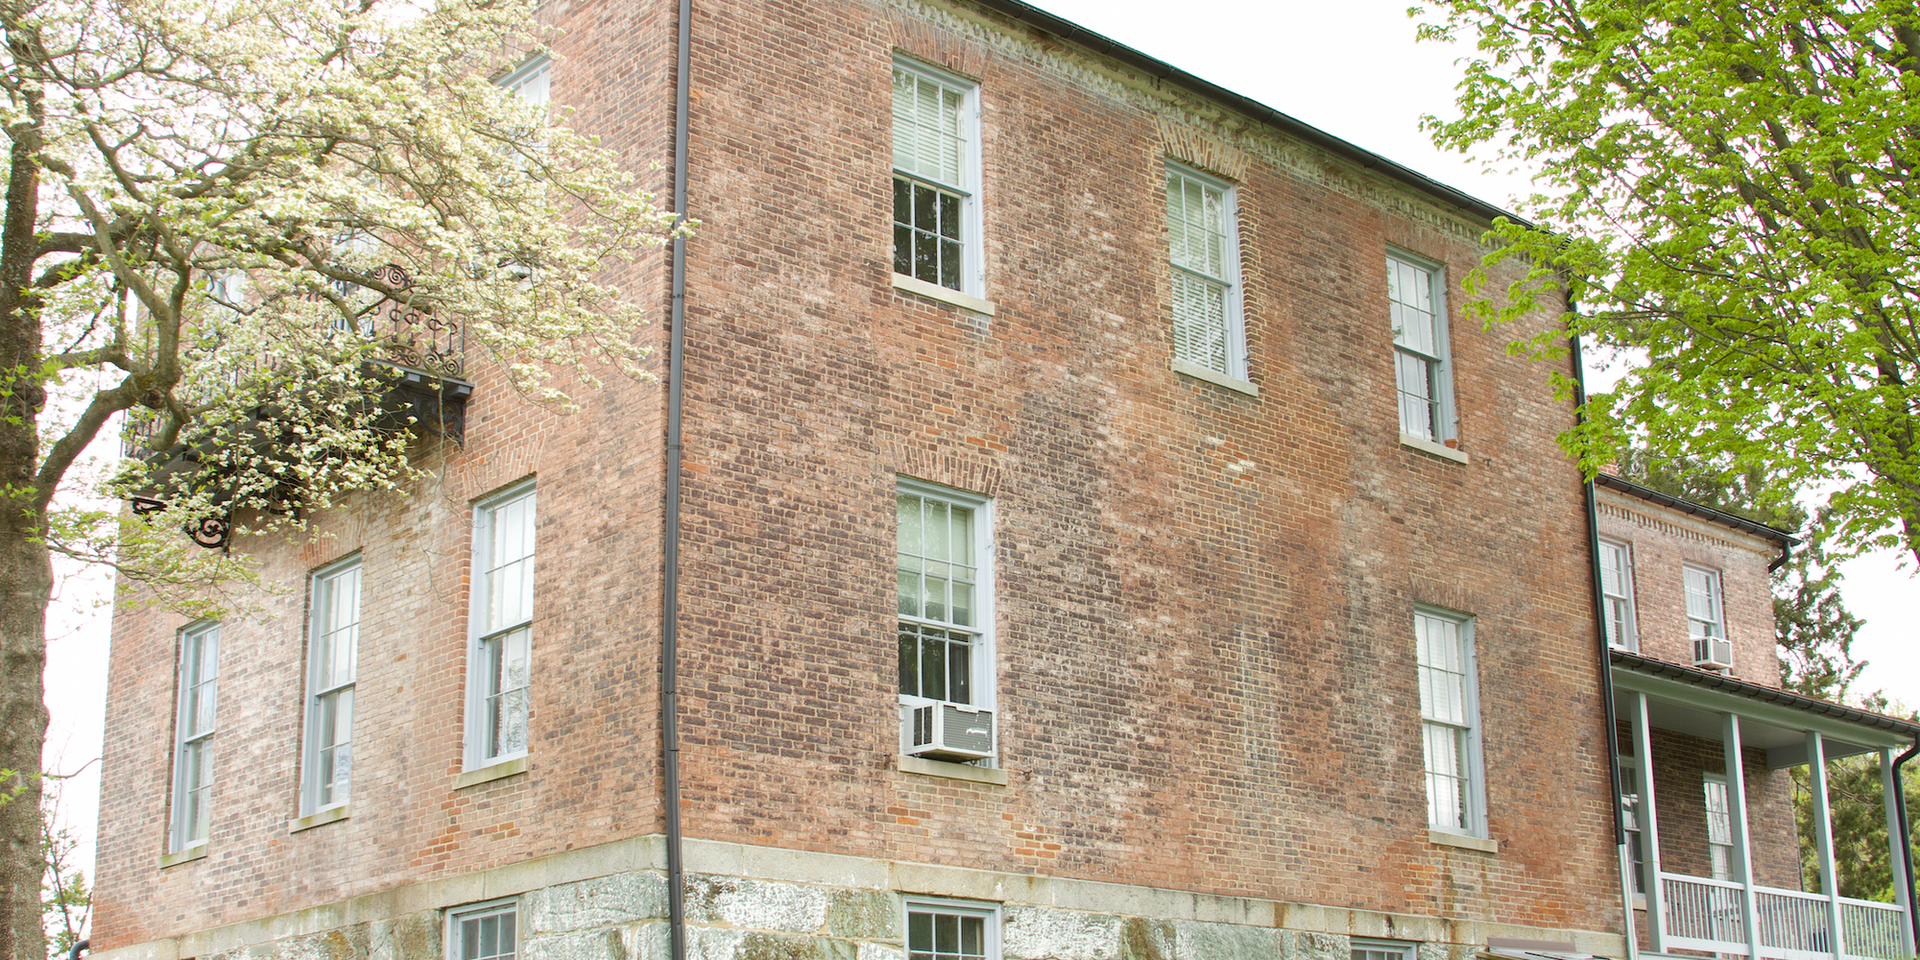 47. Brackett House   (Photo by G. Maurice Ballard)